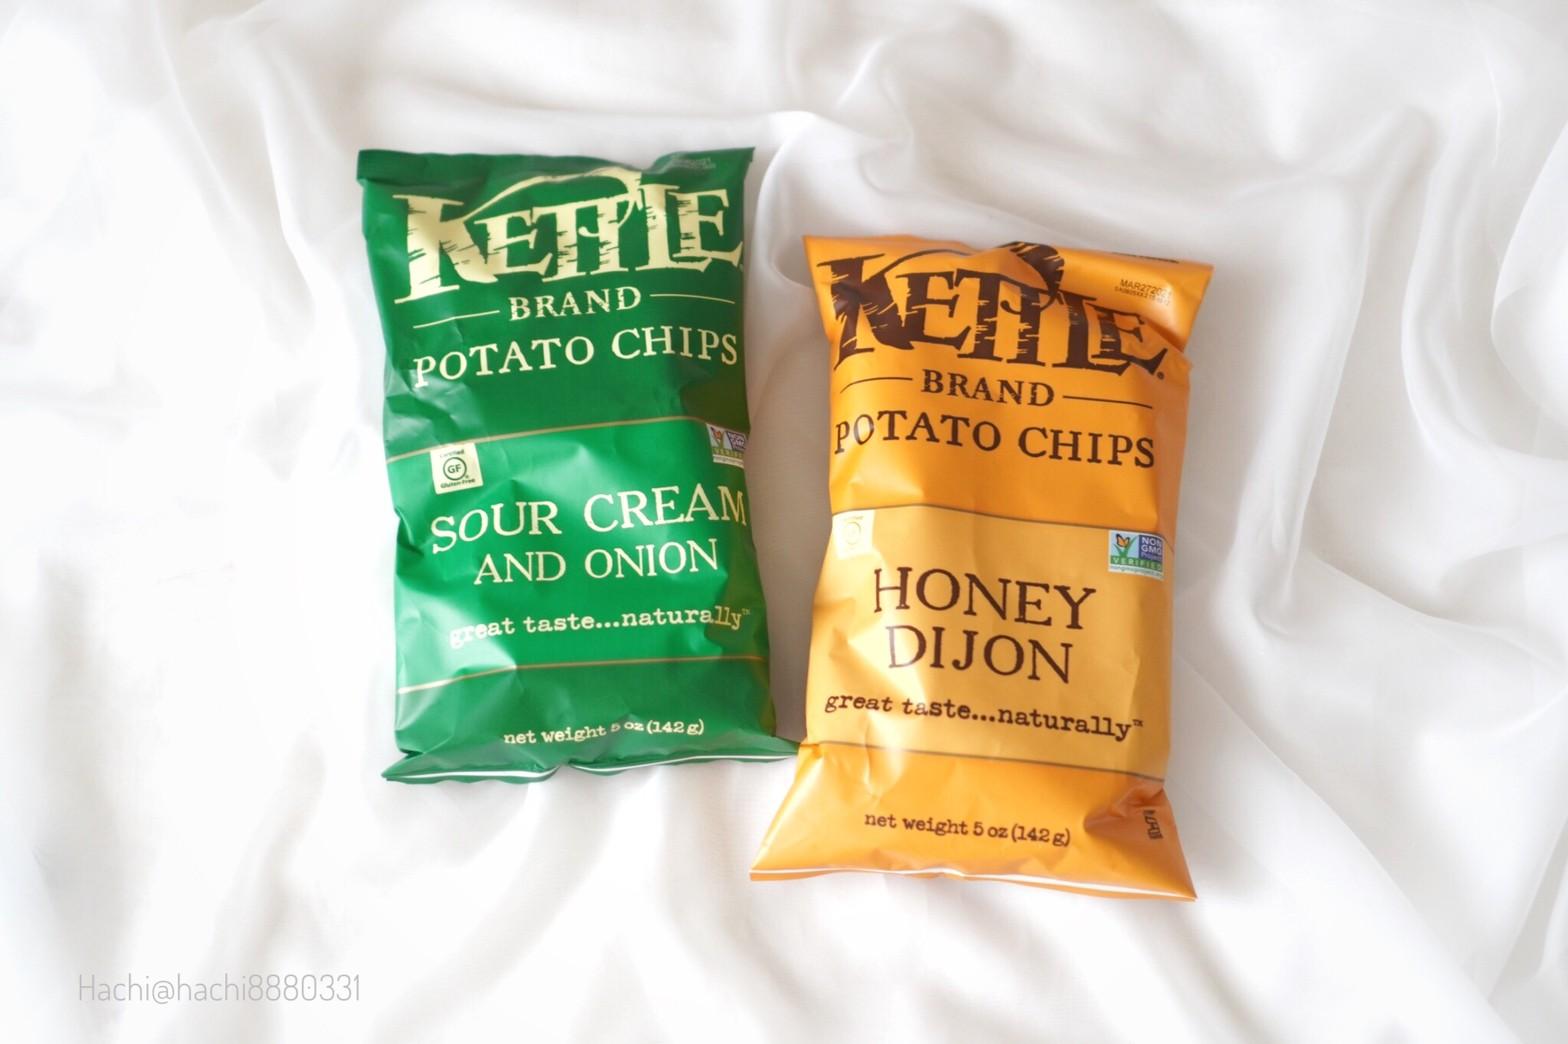 Kettle-Foodsのポテトチップスのハニーディジョンとサワークリーム&オニオン味を並べて